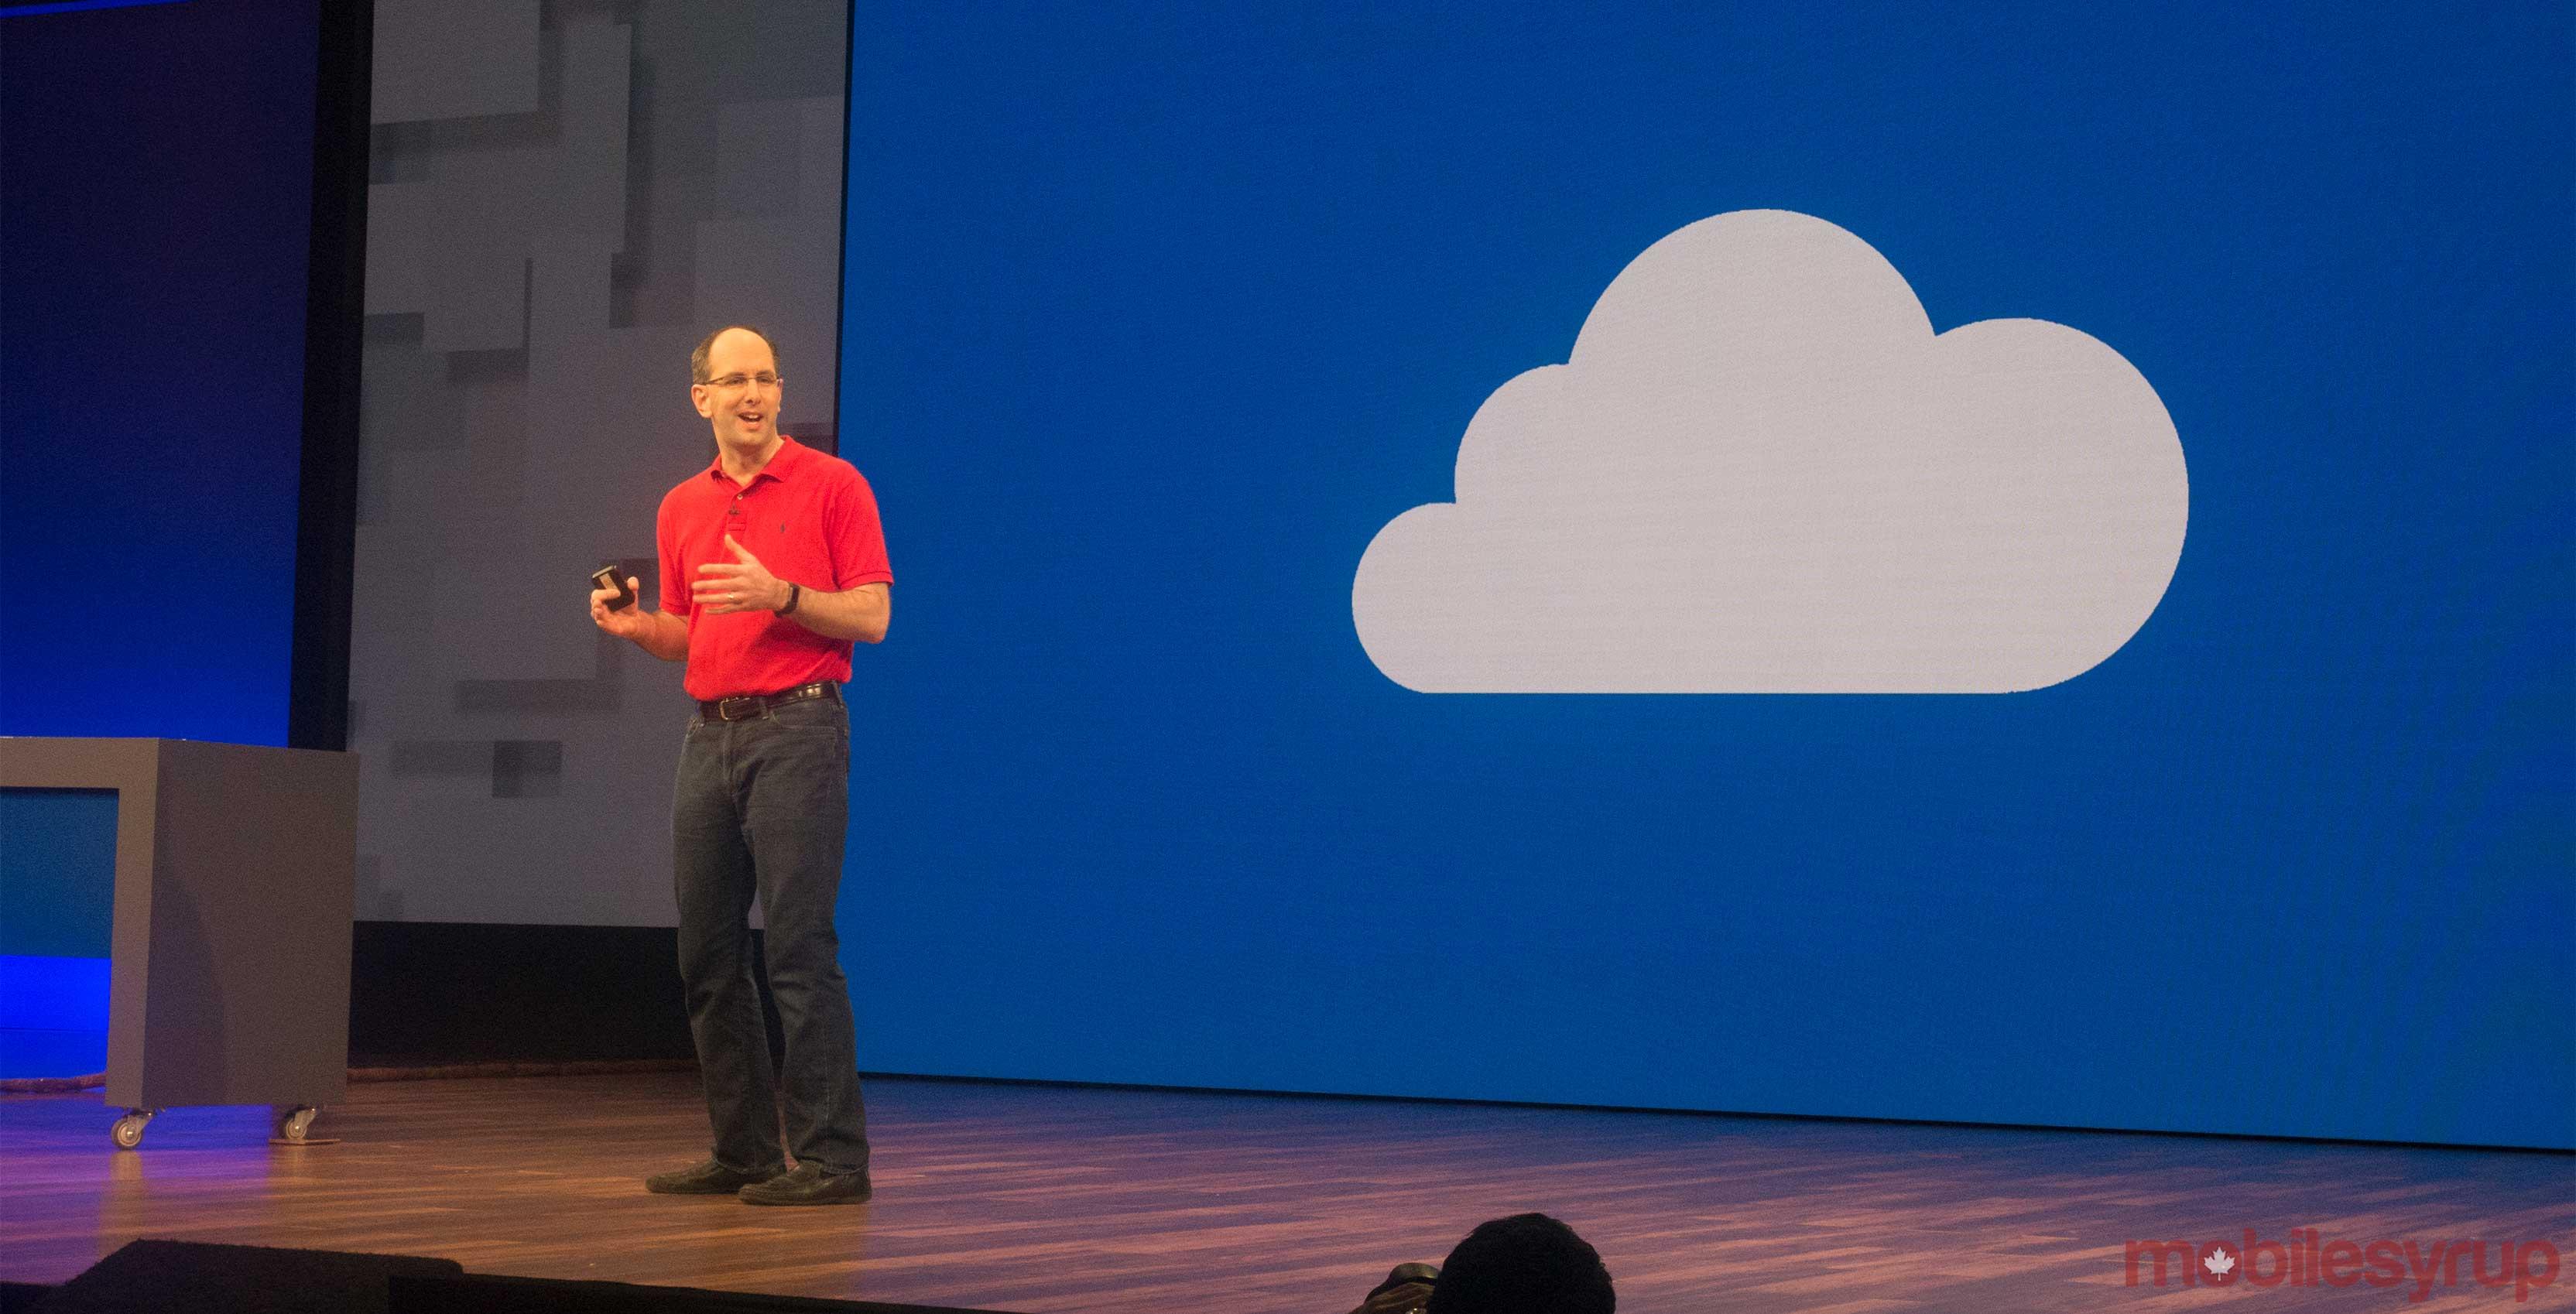 azure cloud build 2017 keynote